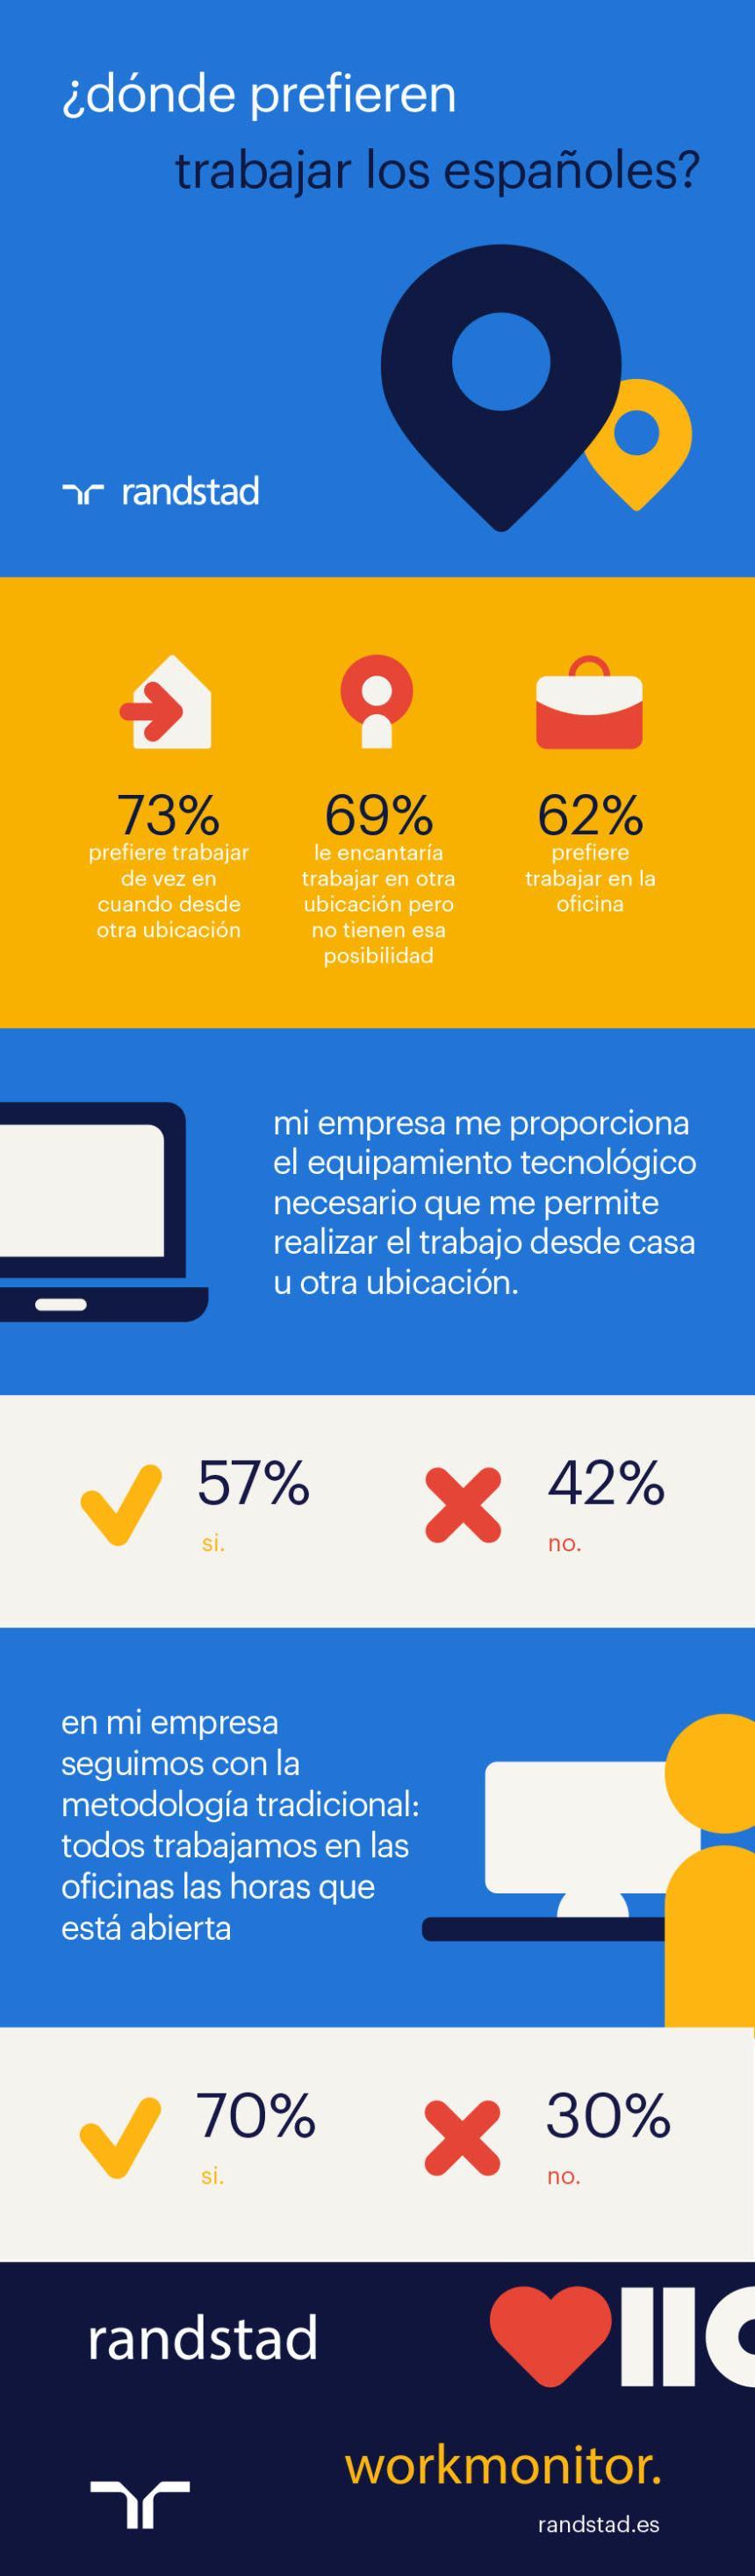 Dónde prefieren trabajar los españoles #infografia #infographic #rrhh